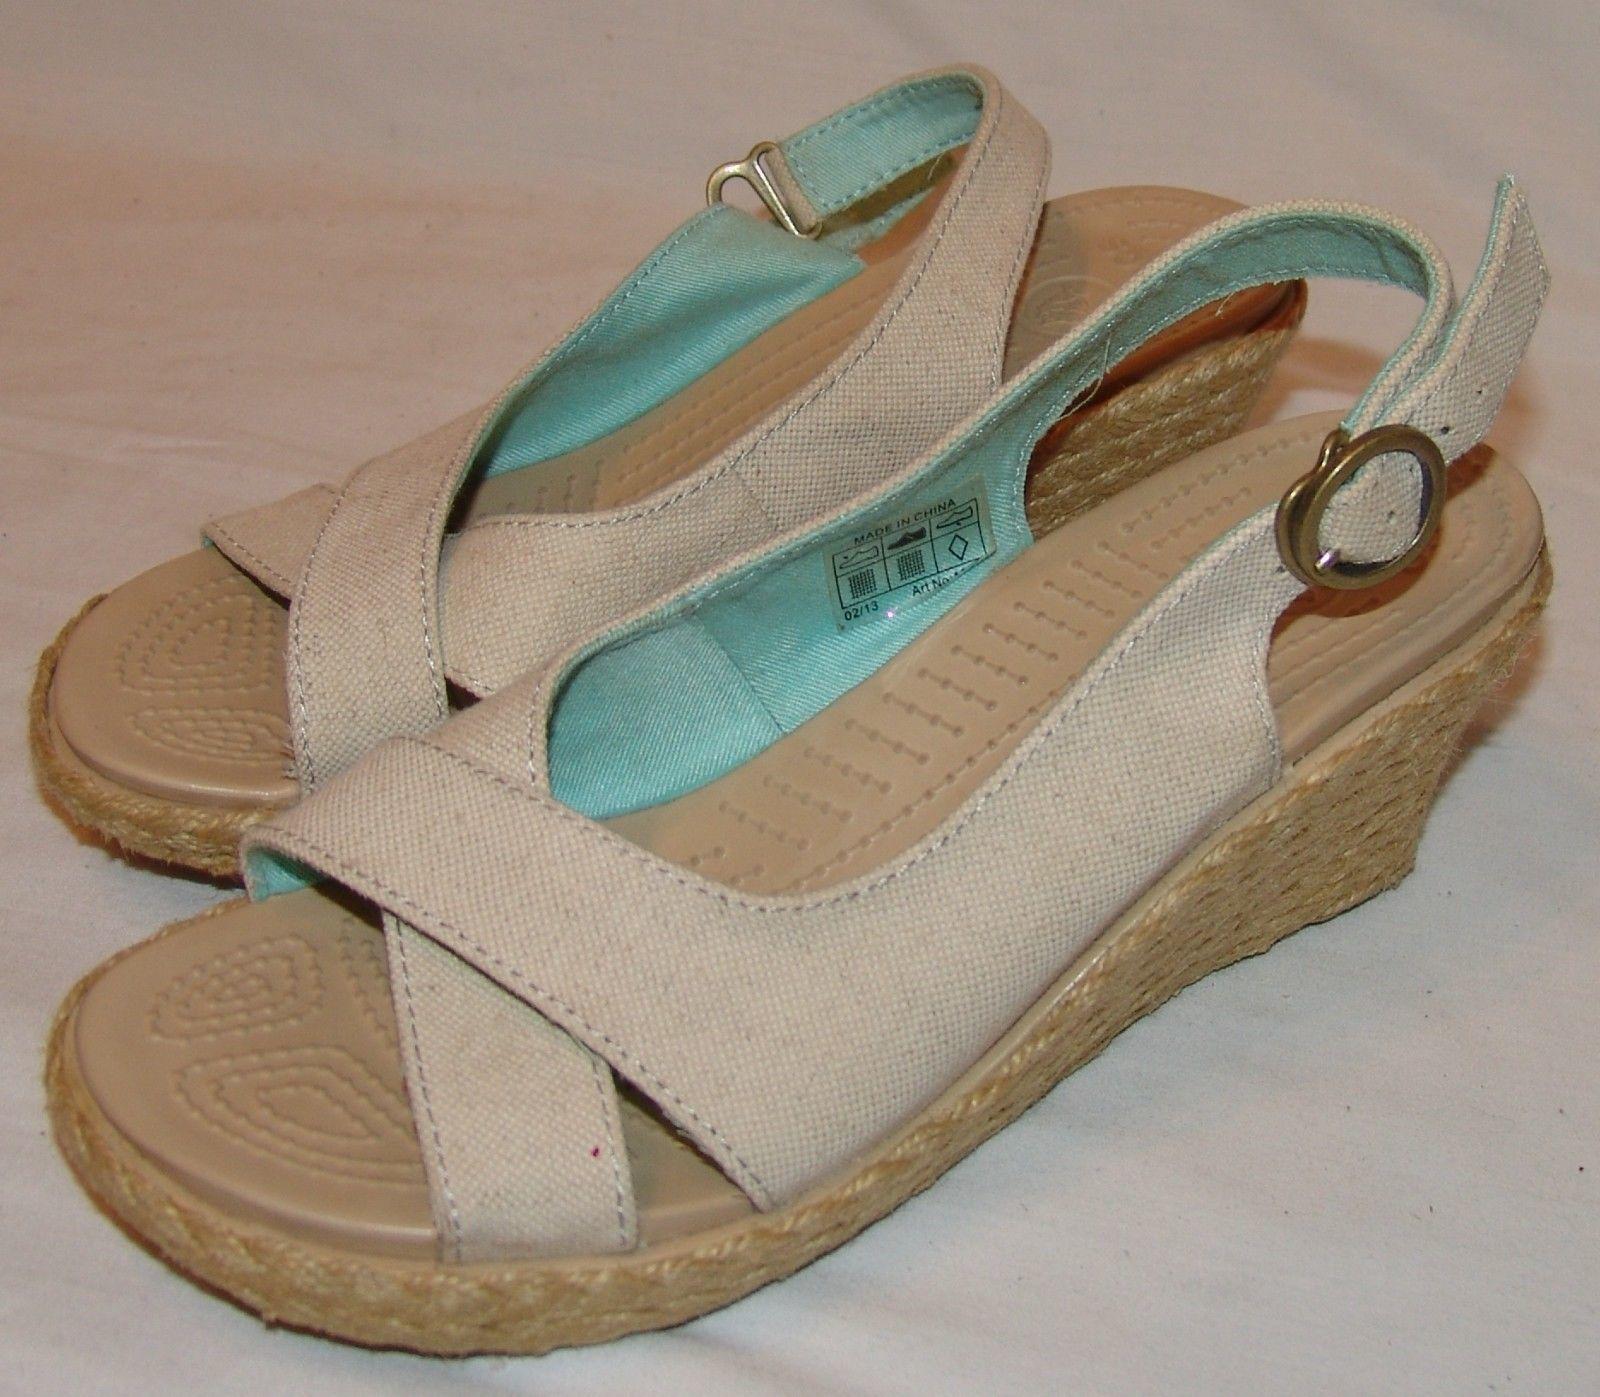 67858abaa0fc8d Crocs Sand Beige Womens Slingback Sling Back and 50 similar items